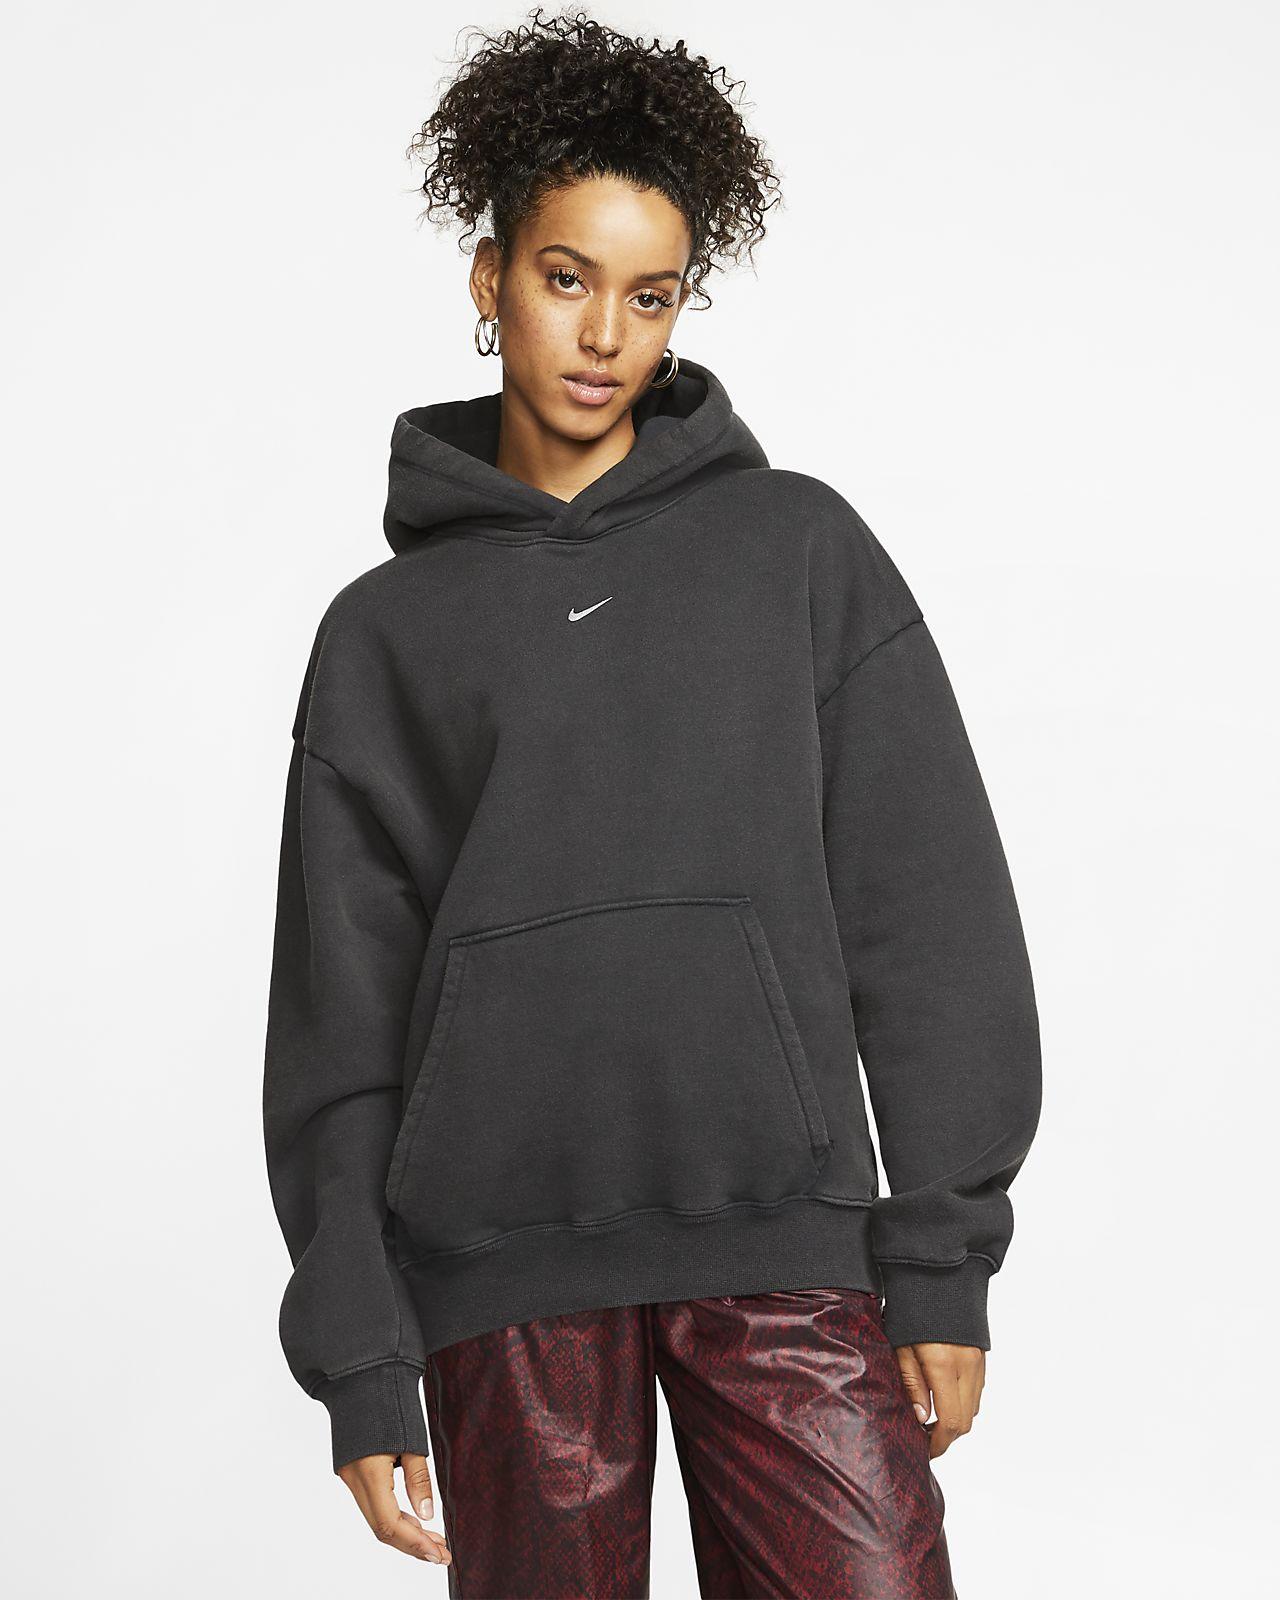 Nike x Olivia Kim Women's Hoodie